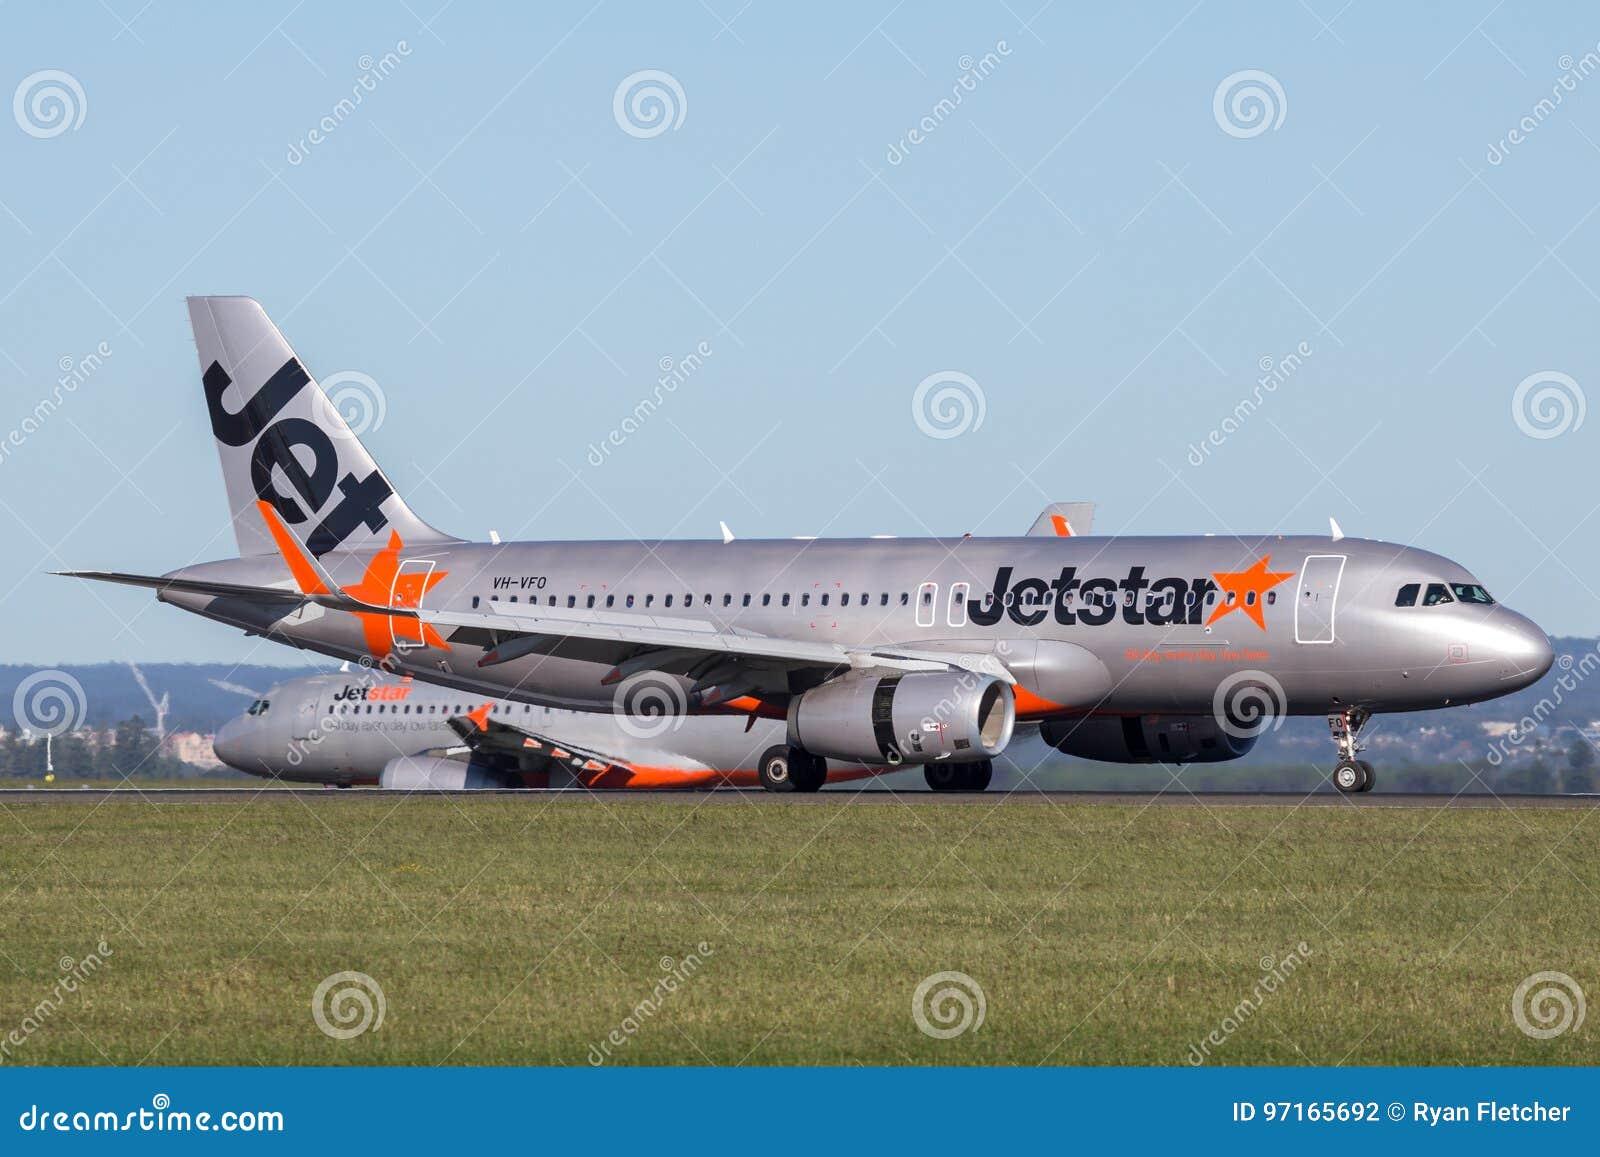 Jetstar Airways Airbus A320 airliner landing at Sydney Airport.